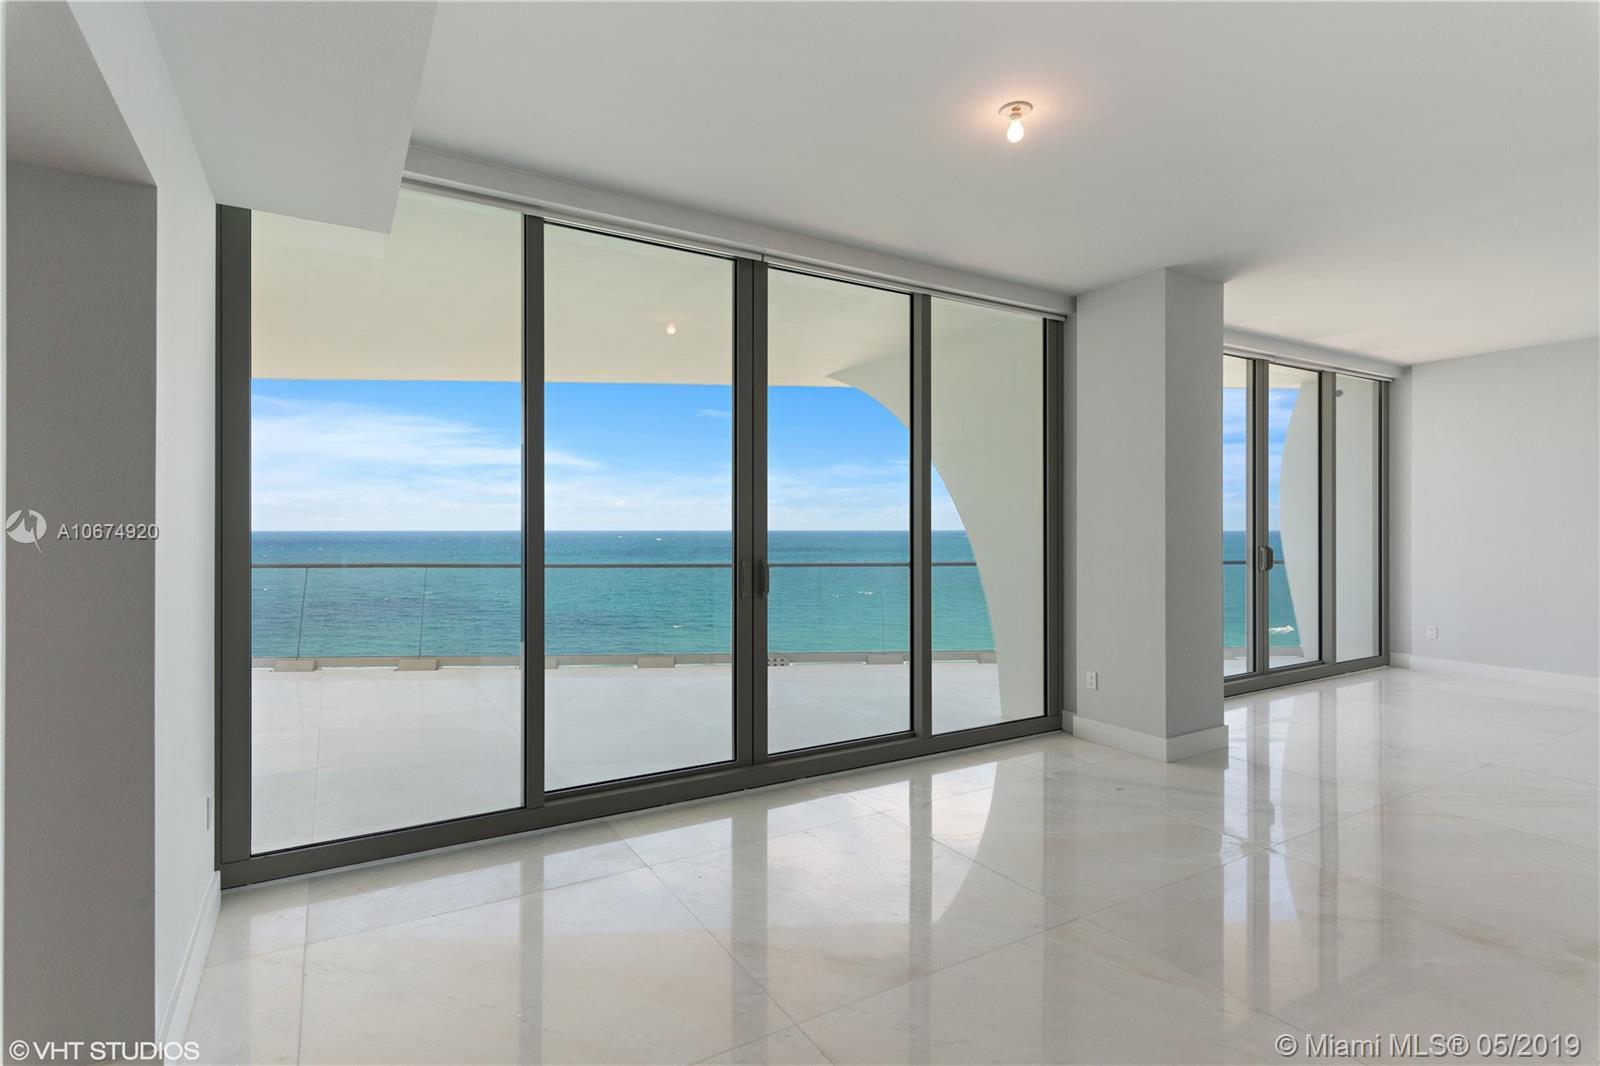 16901 COLLINS AVE, Sunny Isles Beach, Florida